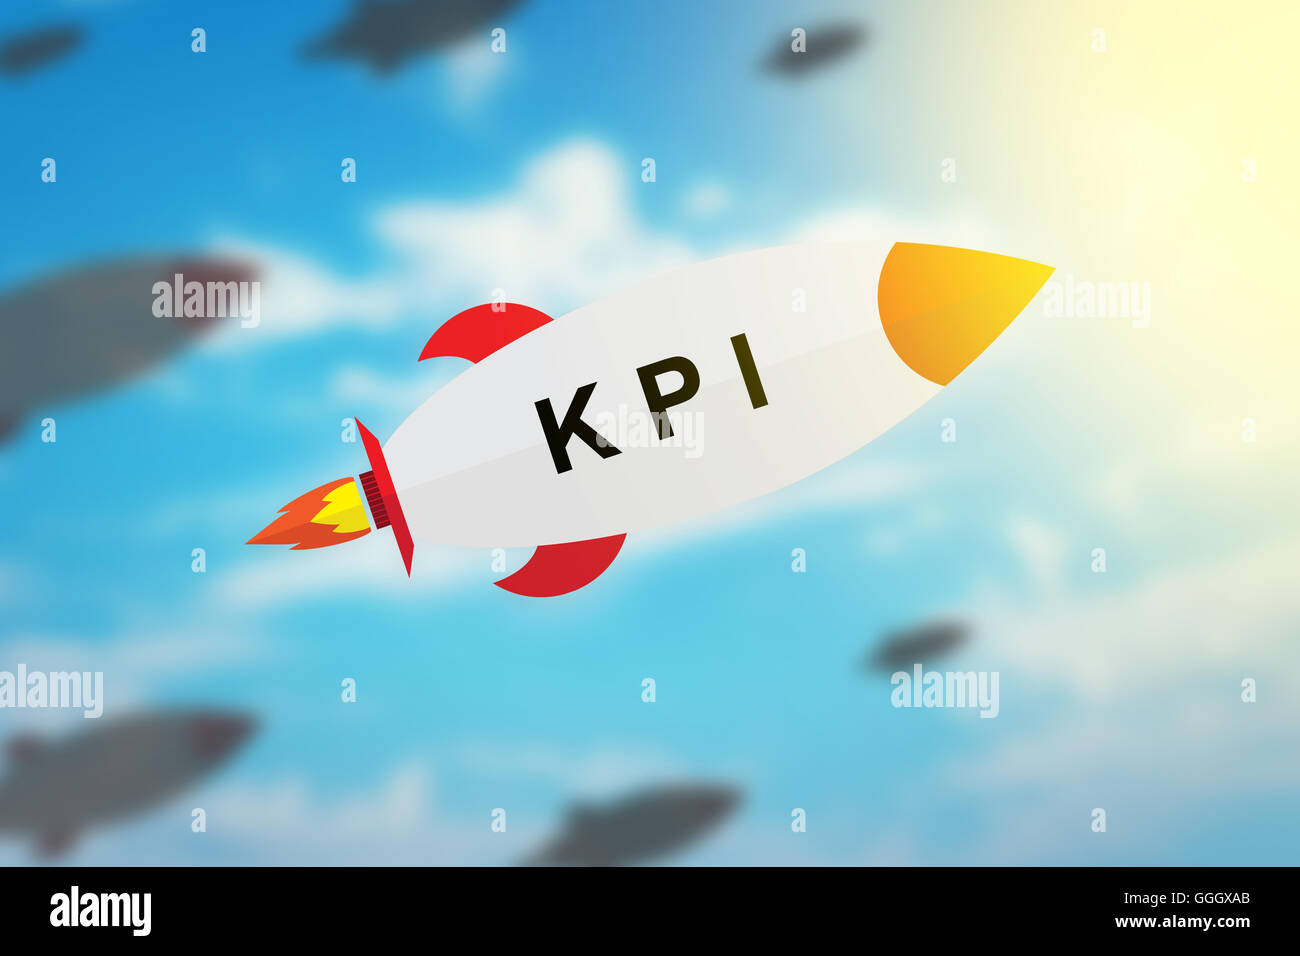 Grupo de KPI o Key Performance Indicator diseño plano cohete con fondo borroso y efecto de luz suave Foto de stock